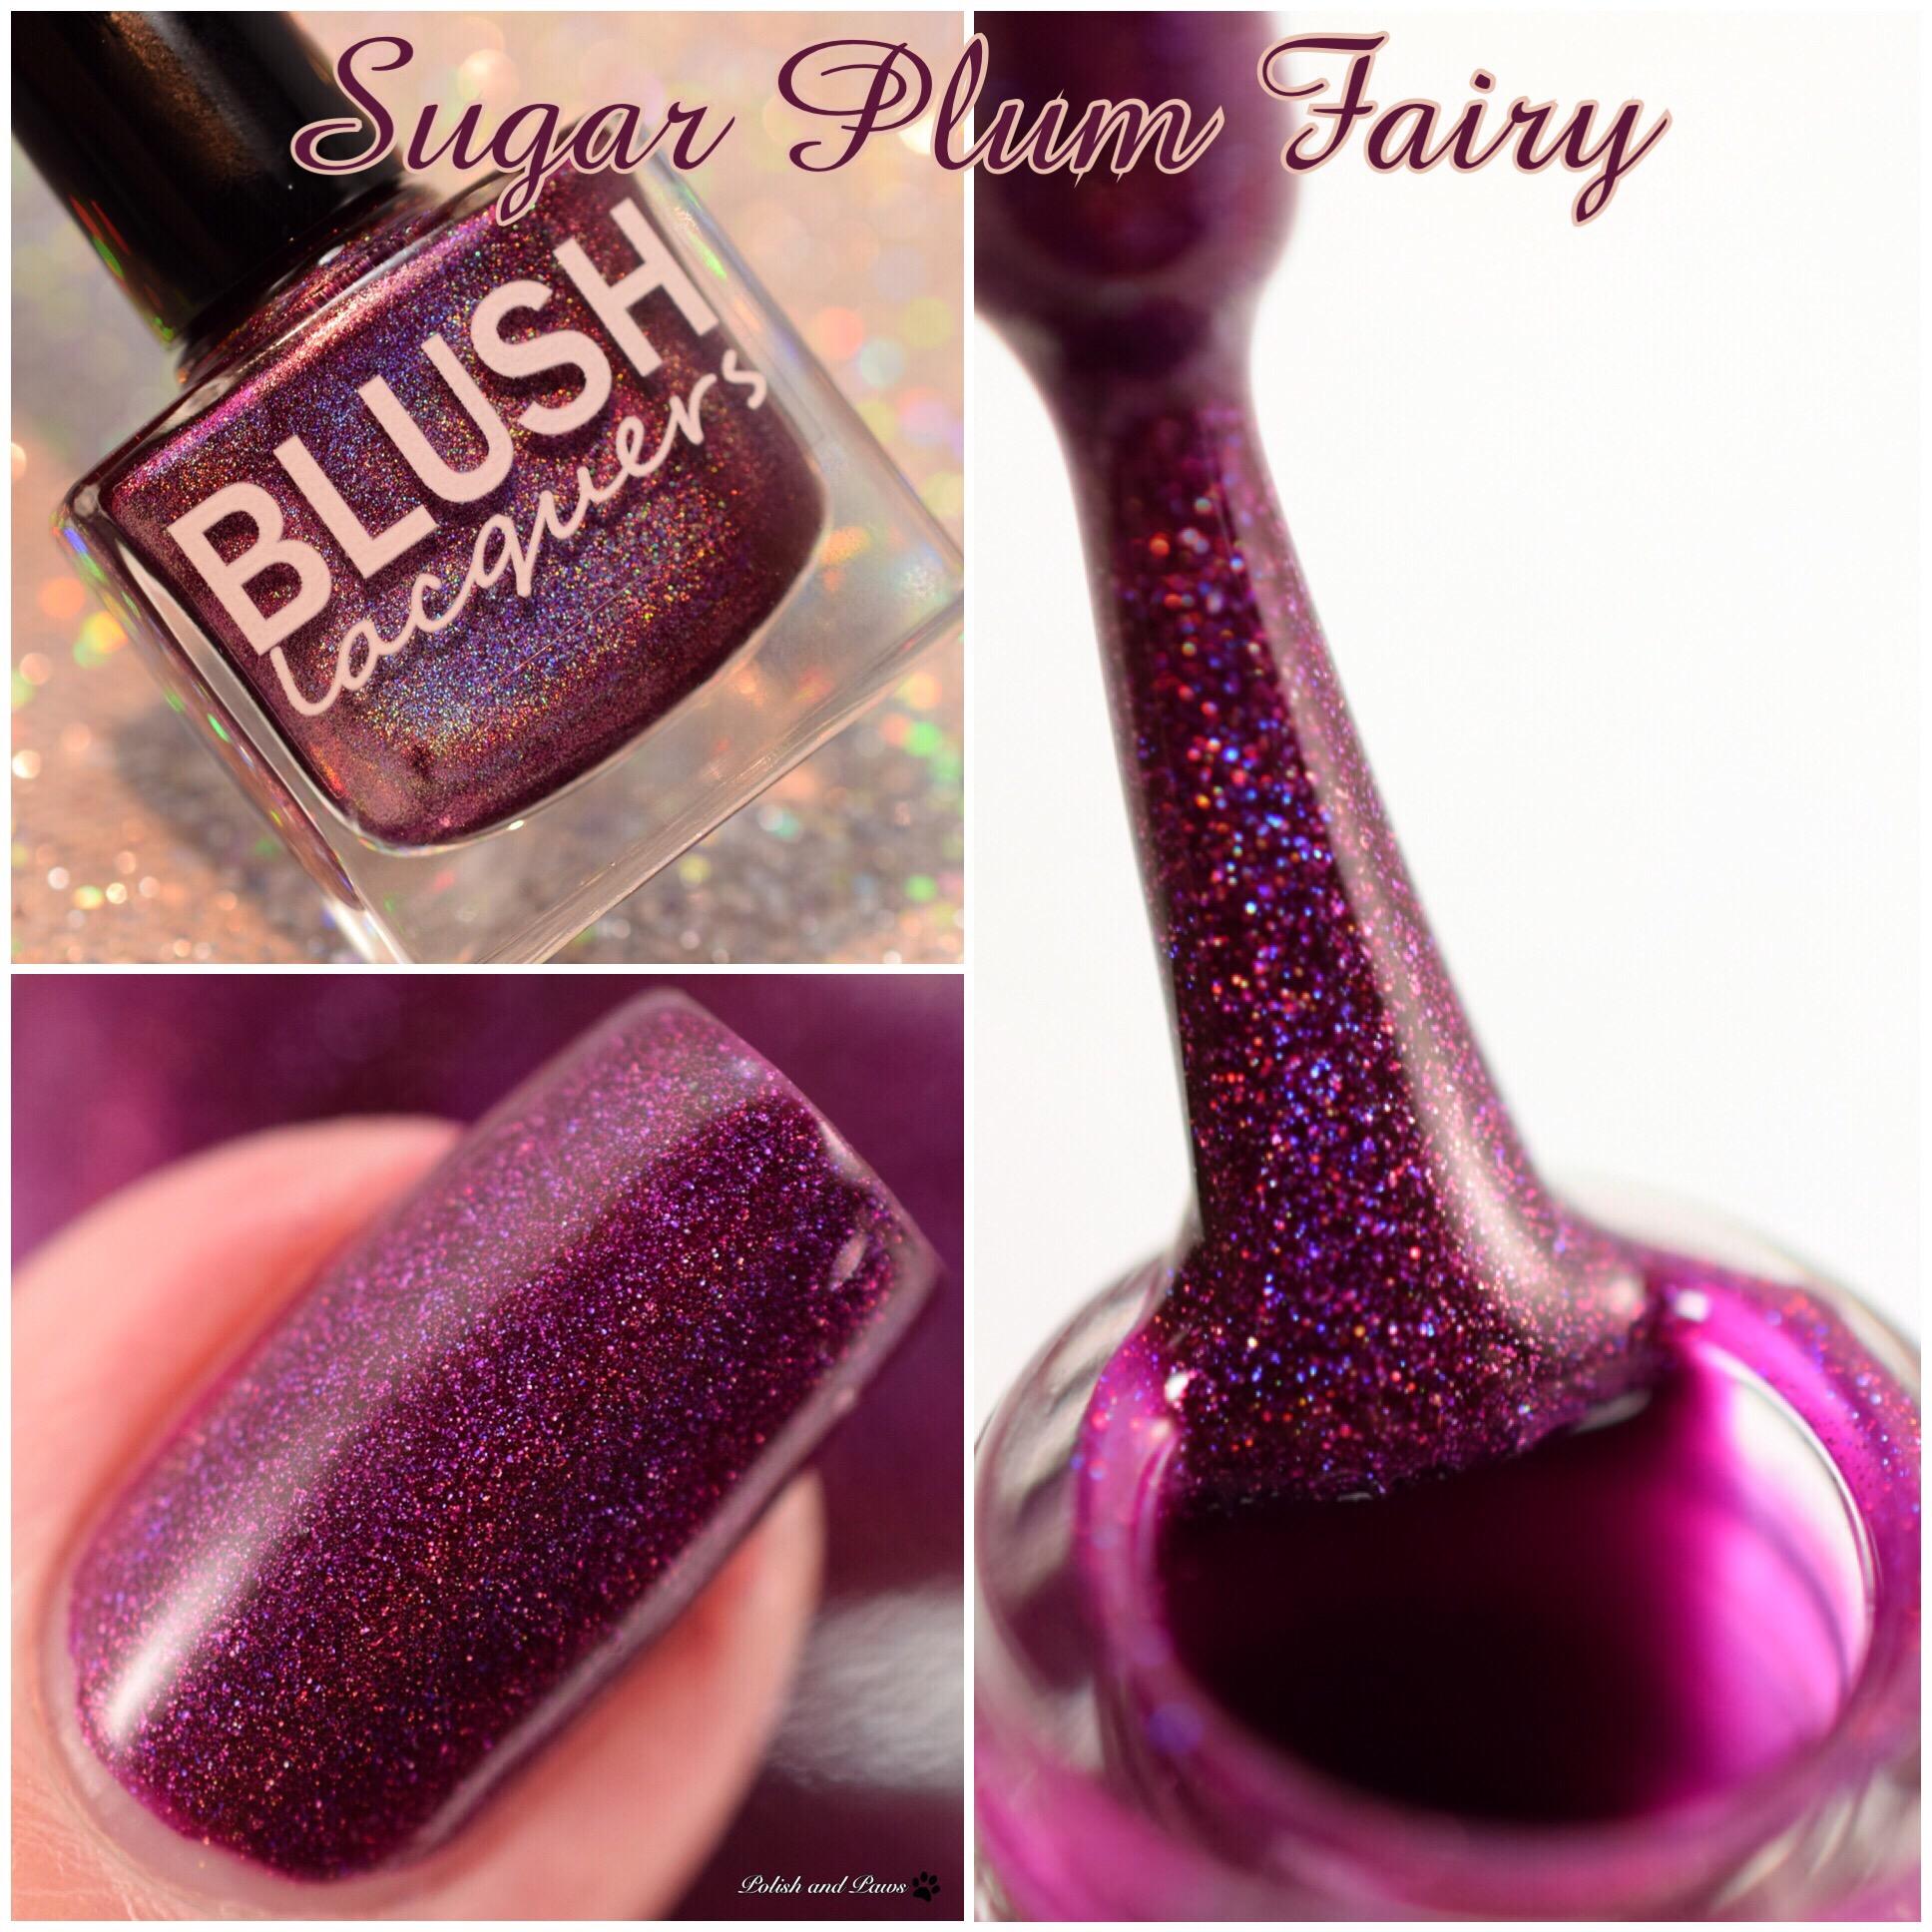 Blush Lacquers Sugar Plum Fairy